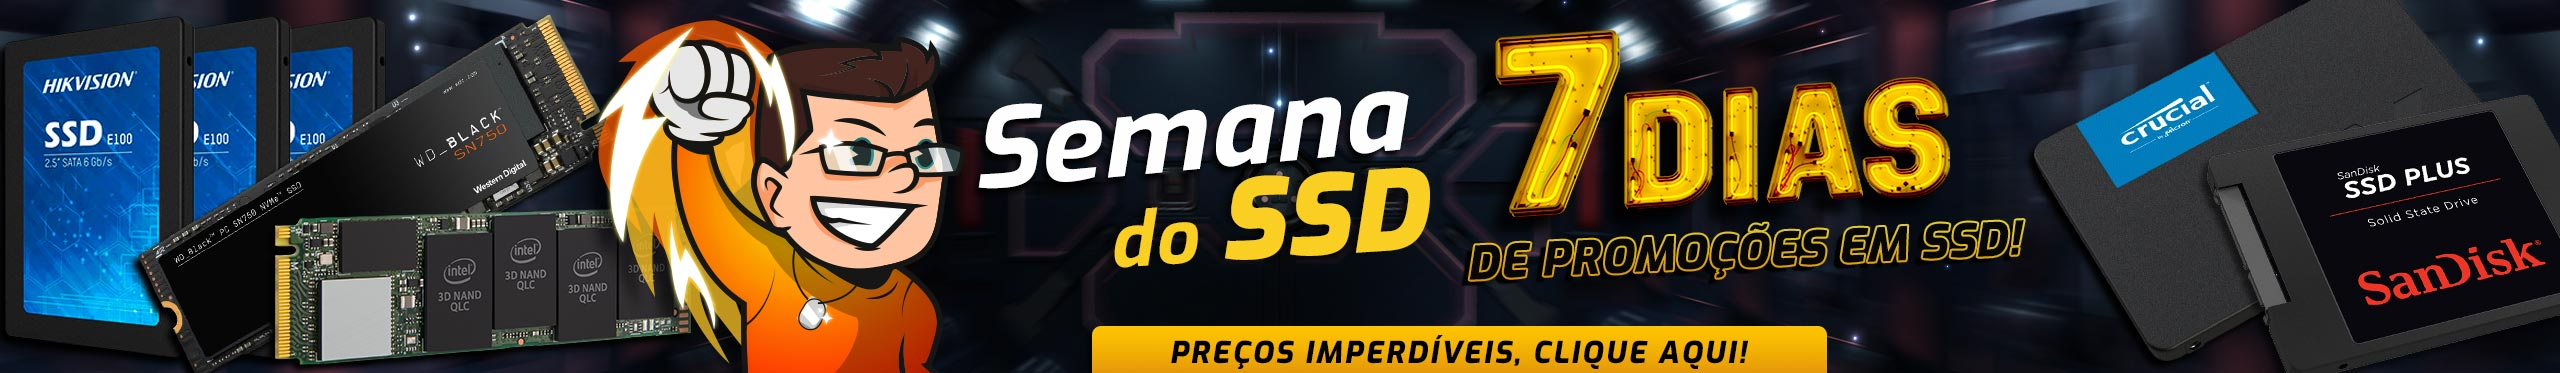 Semana do SSD